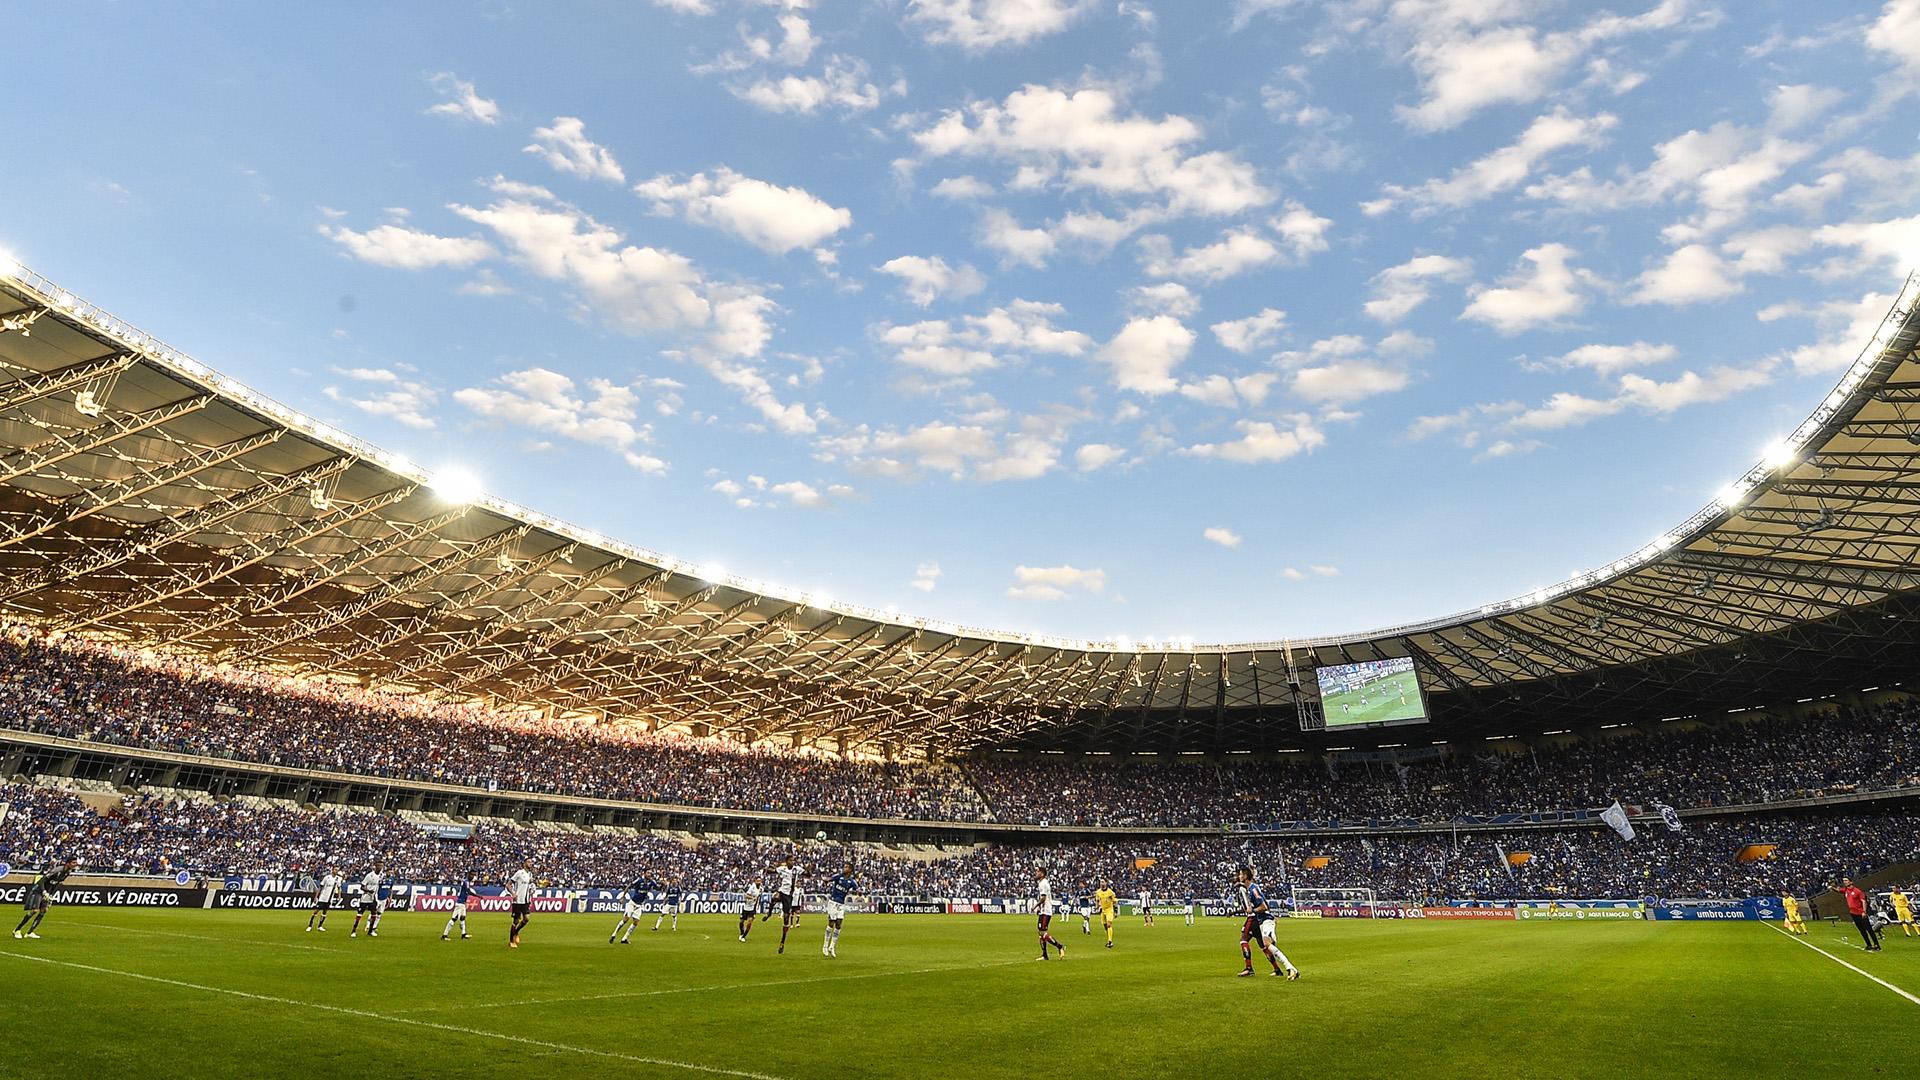 Estadio Mineirao Cruzeiro Flamengo 16072017